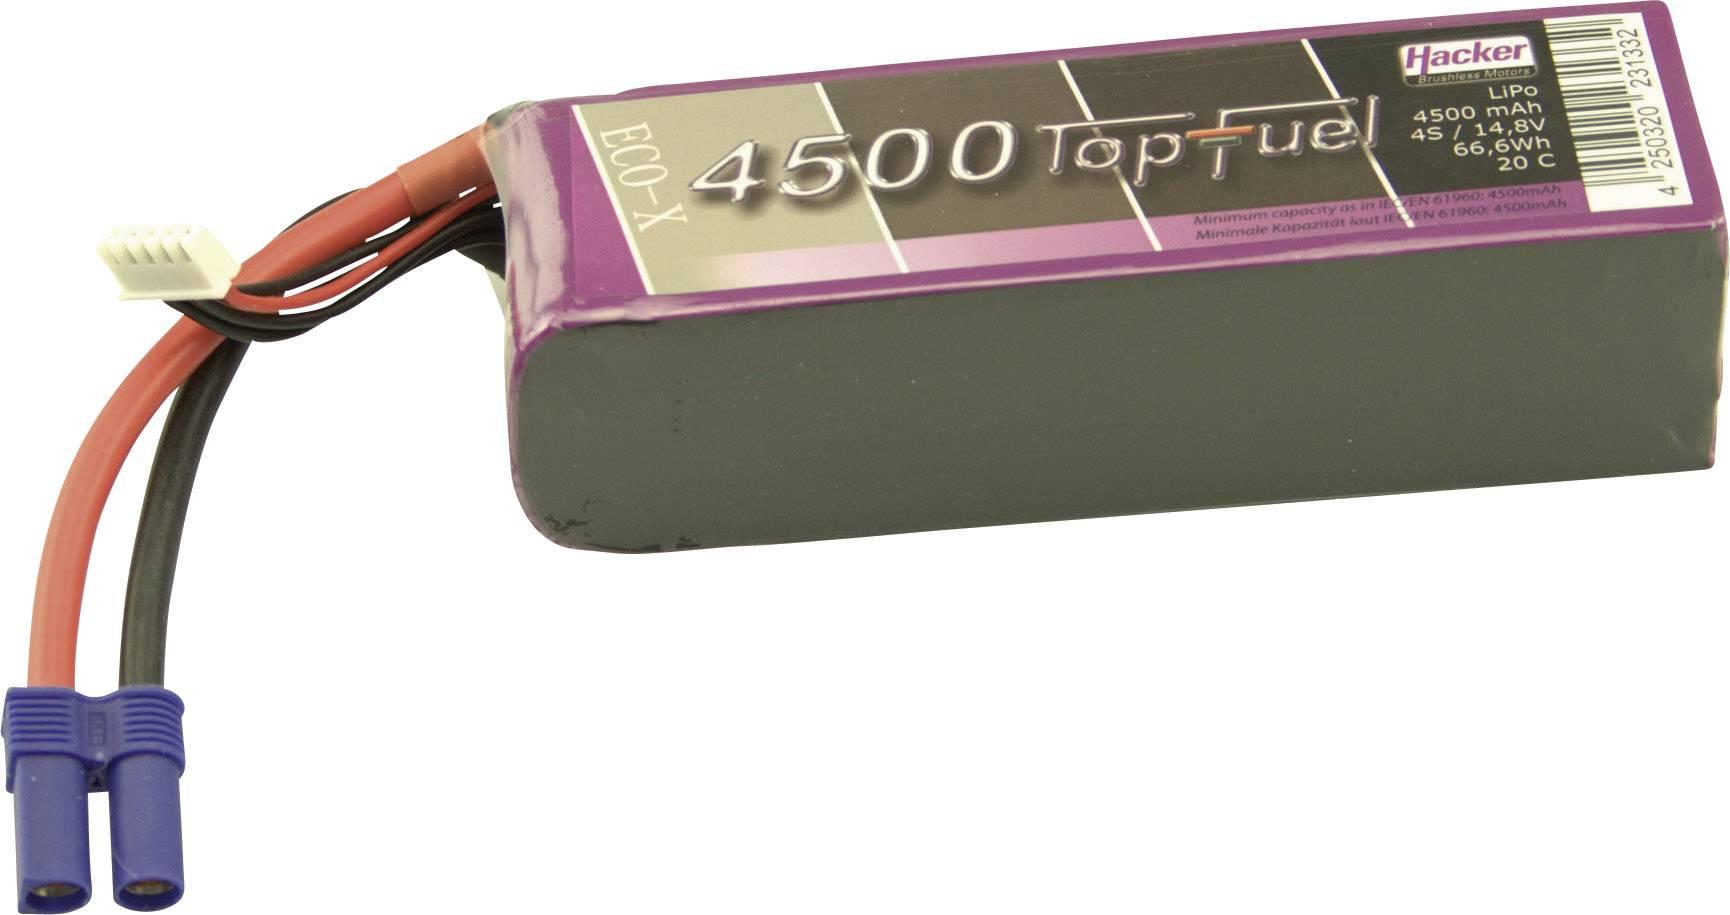 Akupack Li-Pol Hacker 34500431, 14.8 V, 4500 mAh